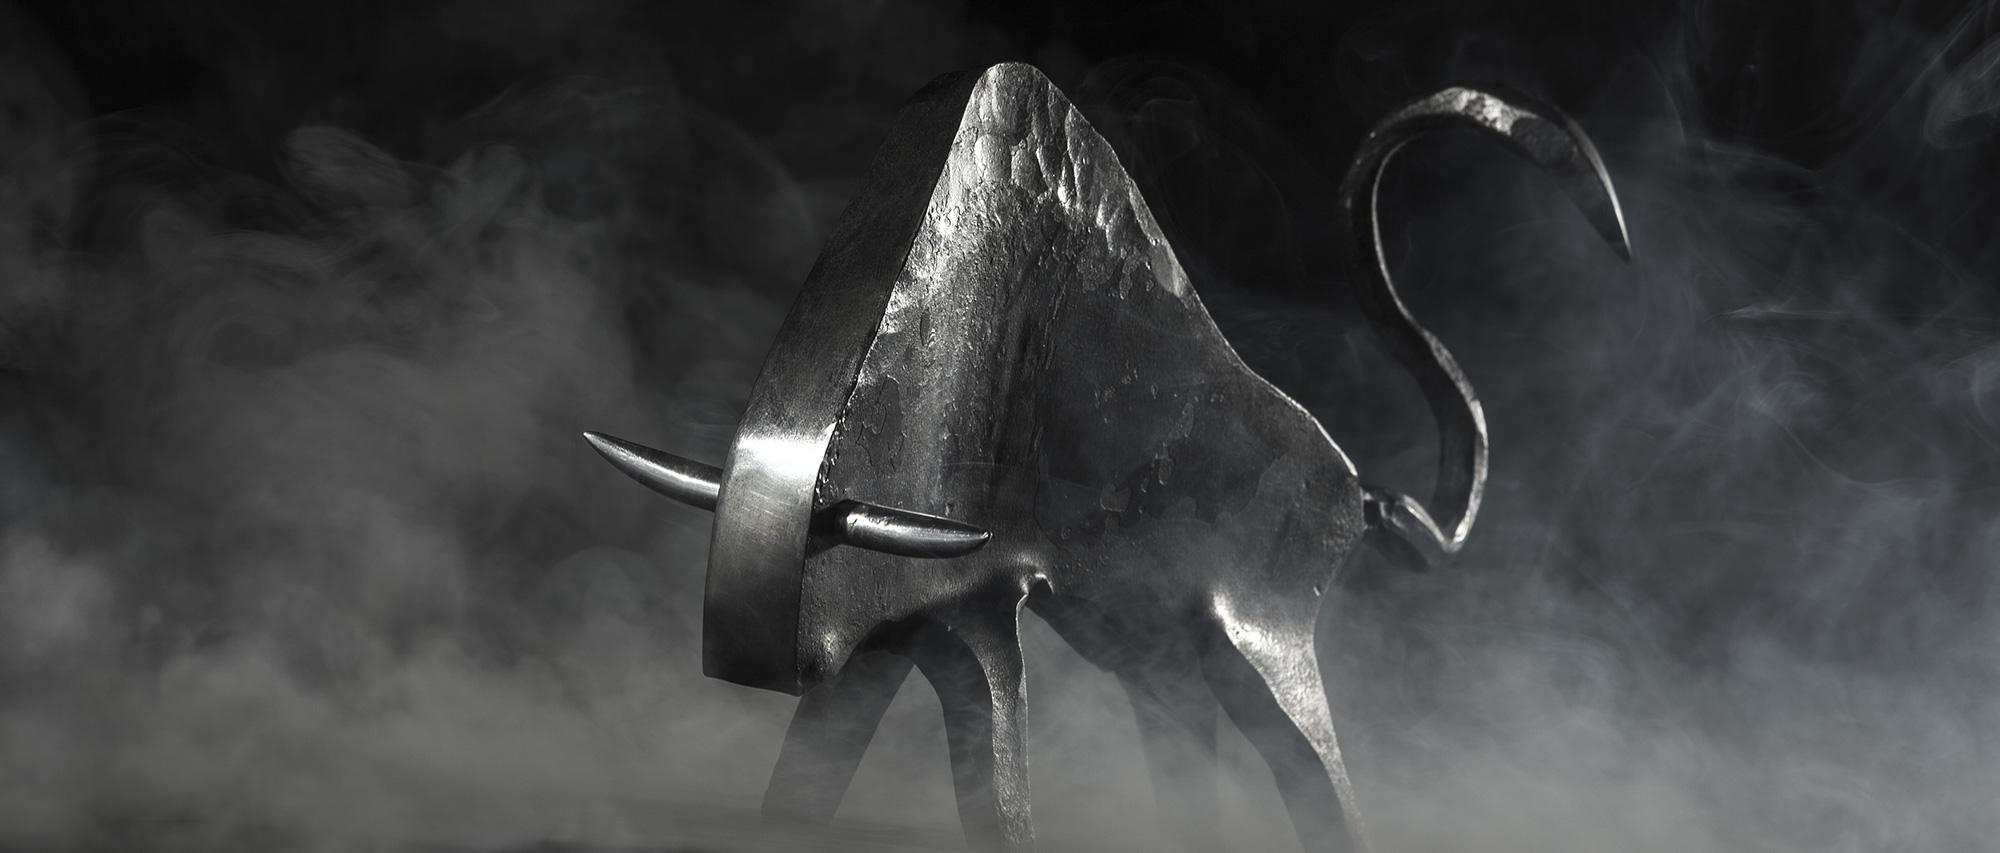 kovane-sochy-zverokruhu